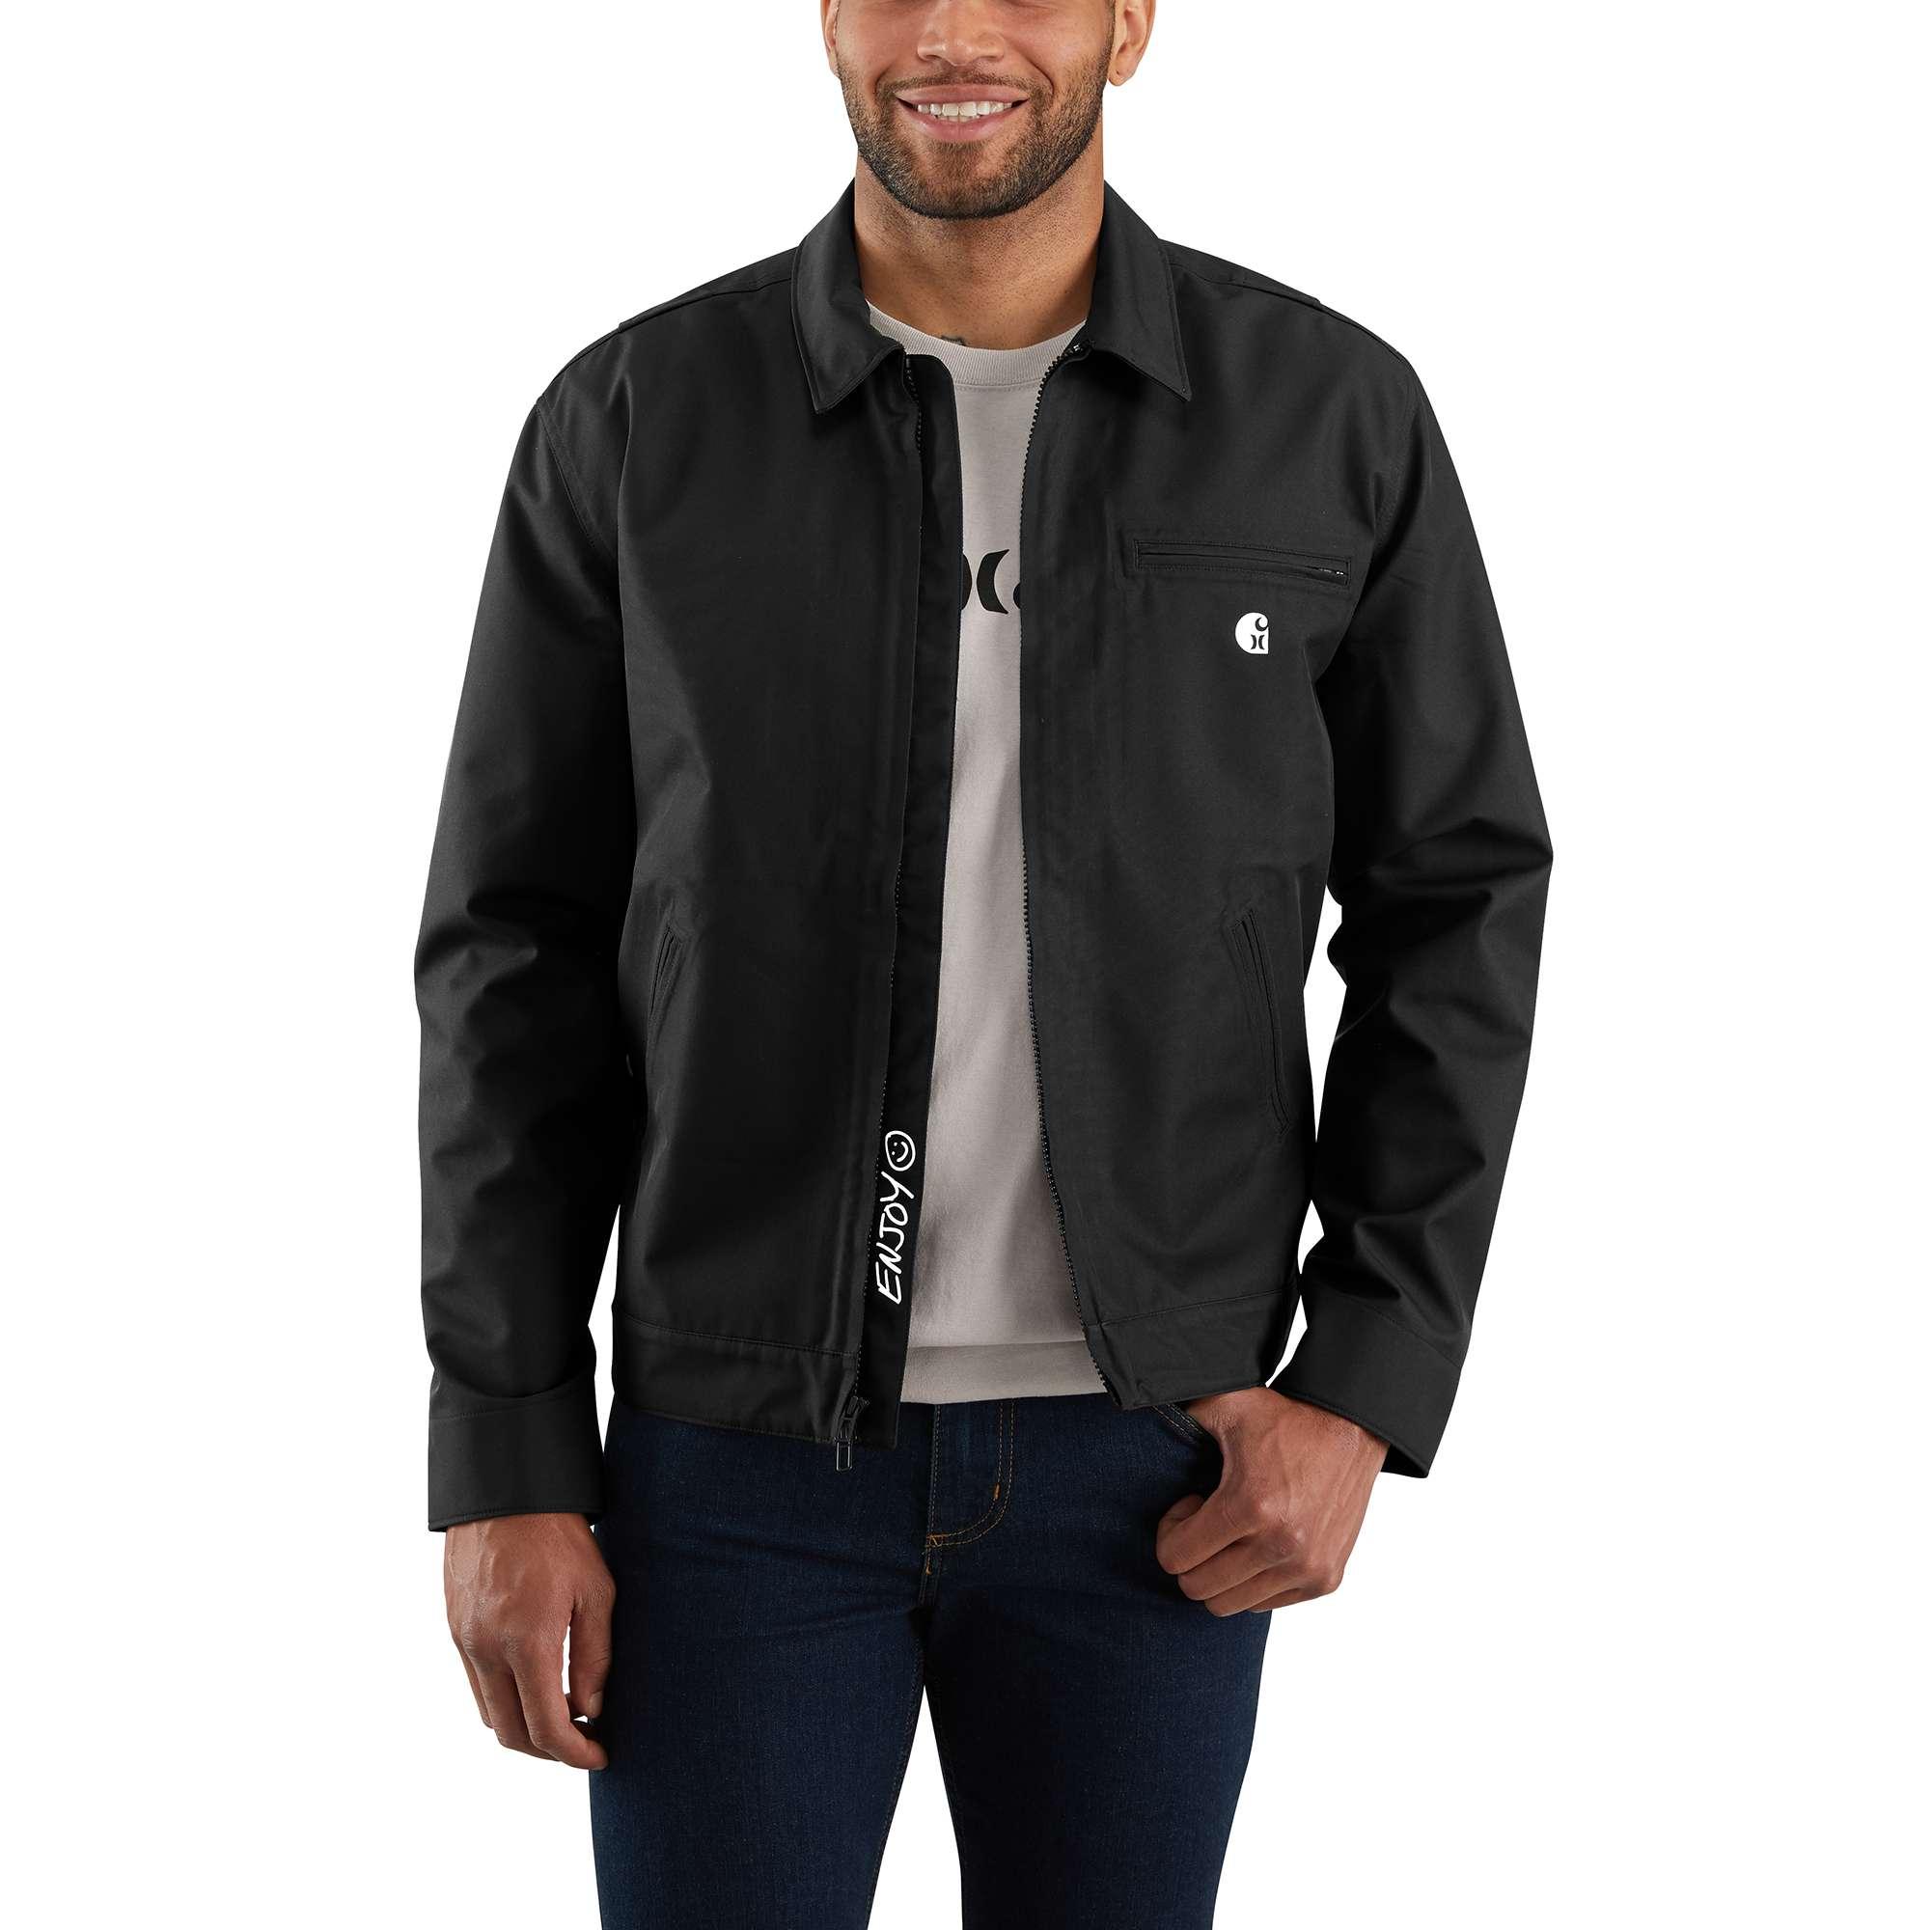 Carhartt Unisex Hurley X Carhartt Men's Classic Workwear Jacket | Carhartt